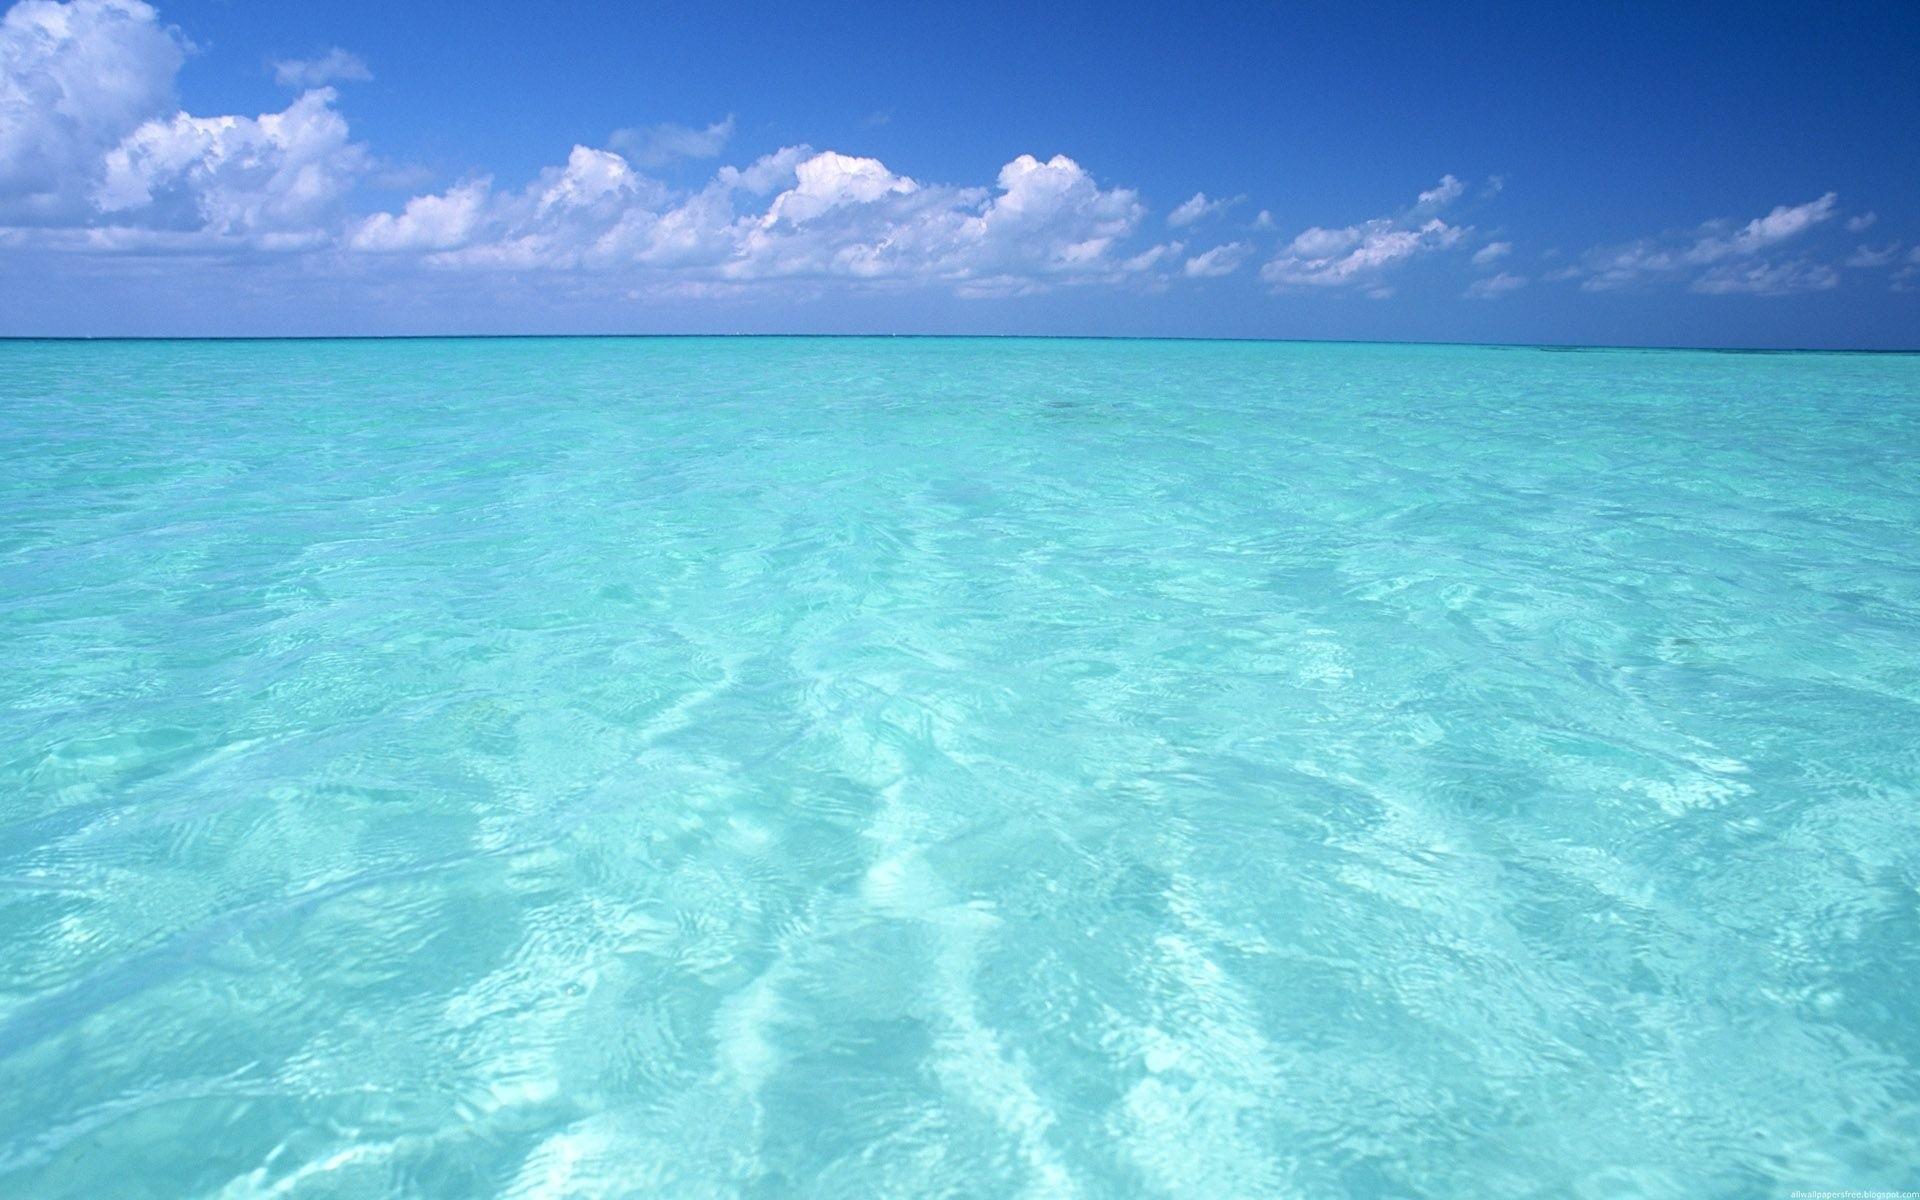 Oceans: Turquoise Sea Oceans Aqua Nature Beautiful Ocean Wallpaper ...